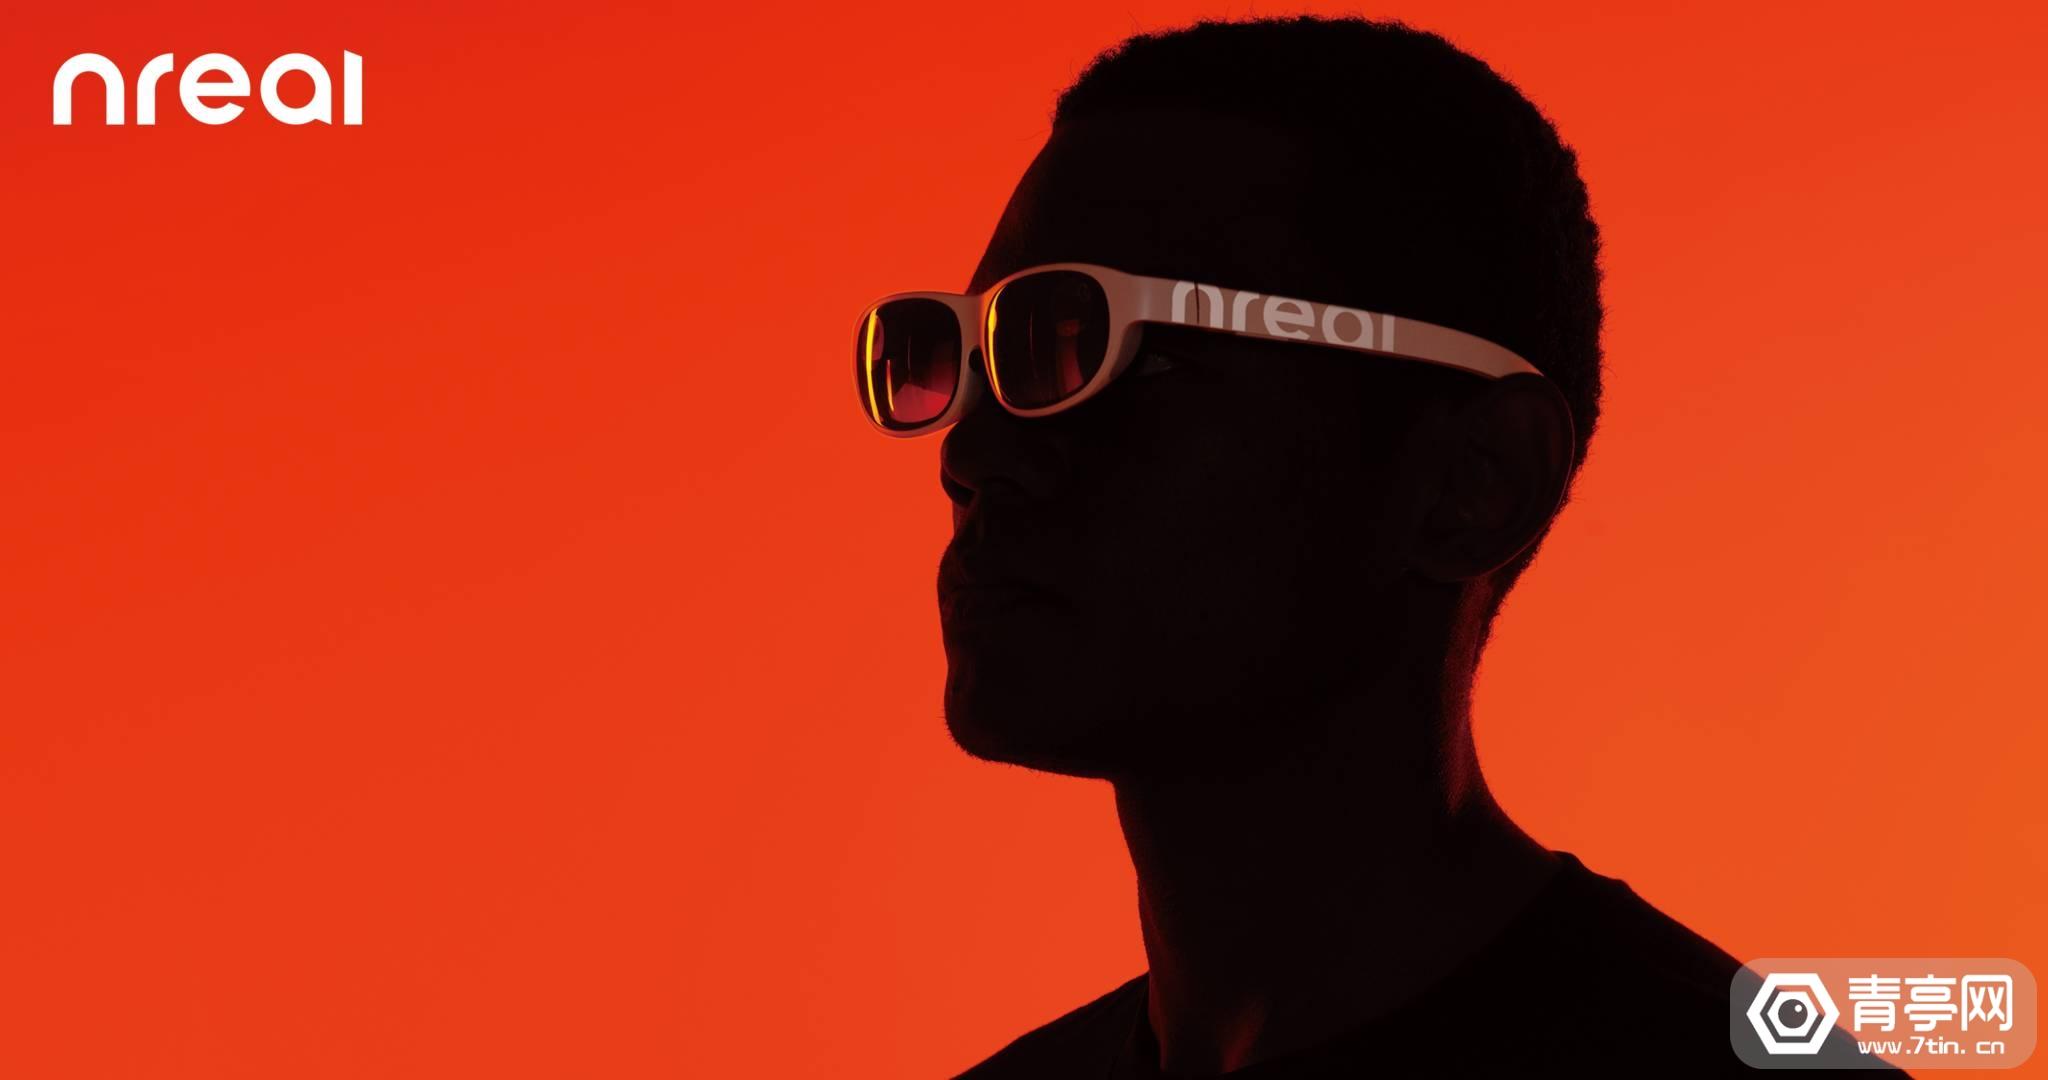 Nreal下周公布新AR眼镜,体积更轻、价格更低